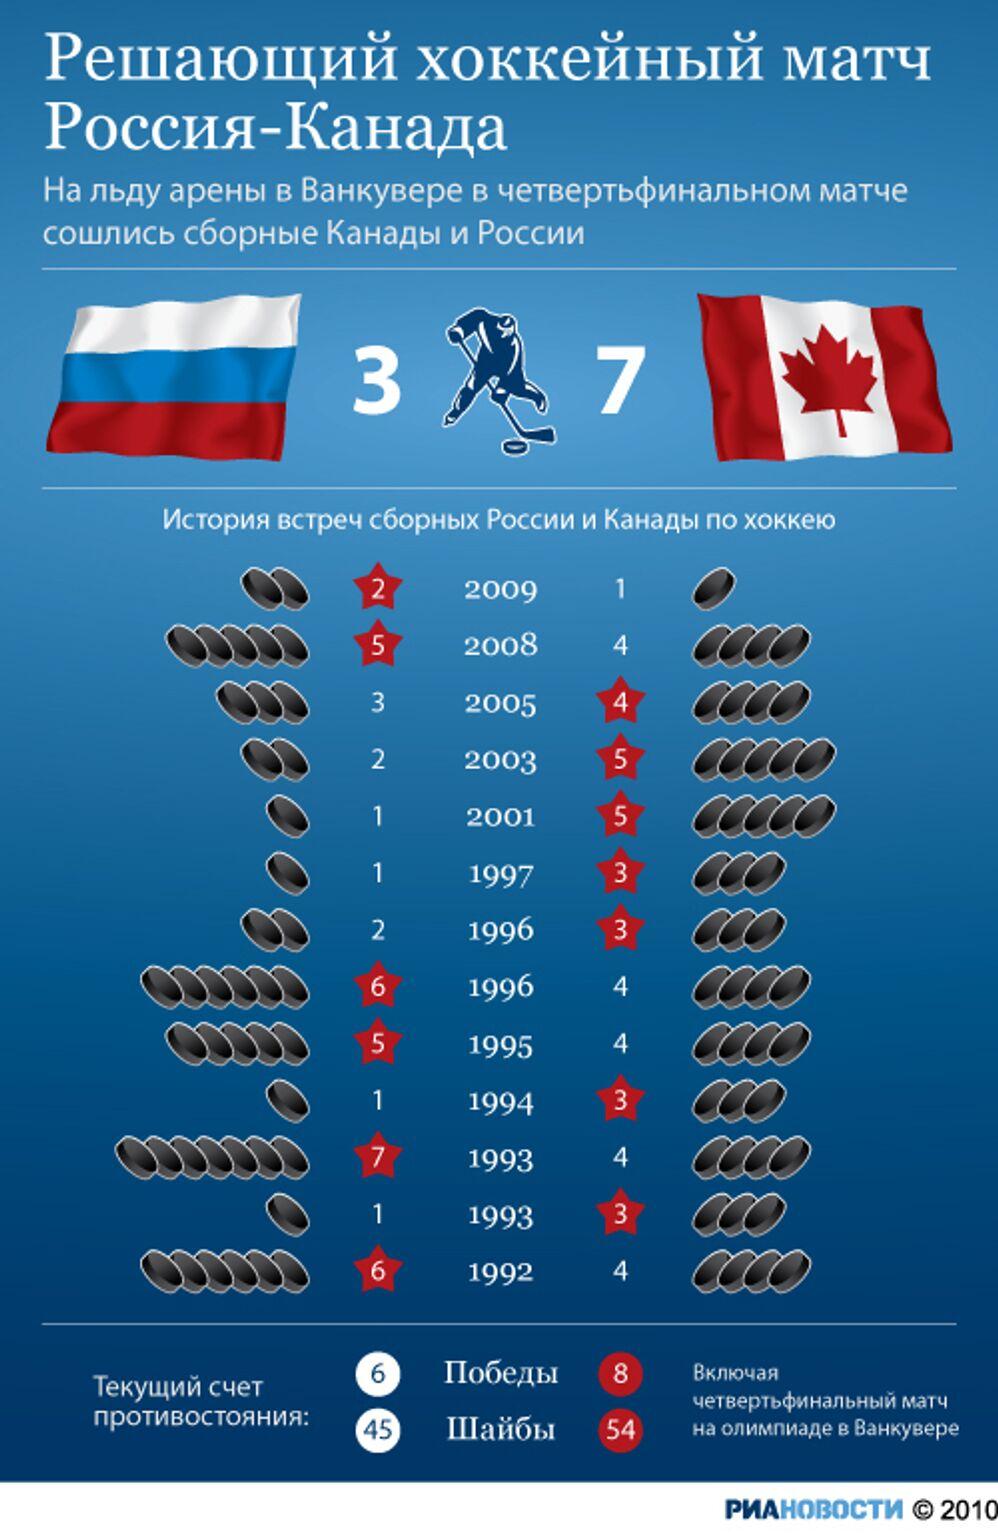 Решающий хоккейный матч Россия-Канада